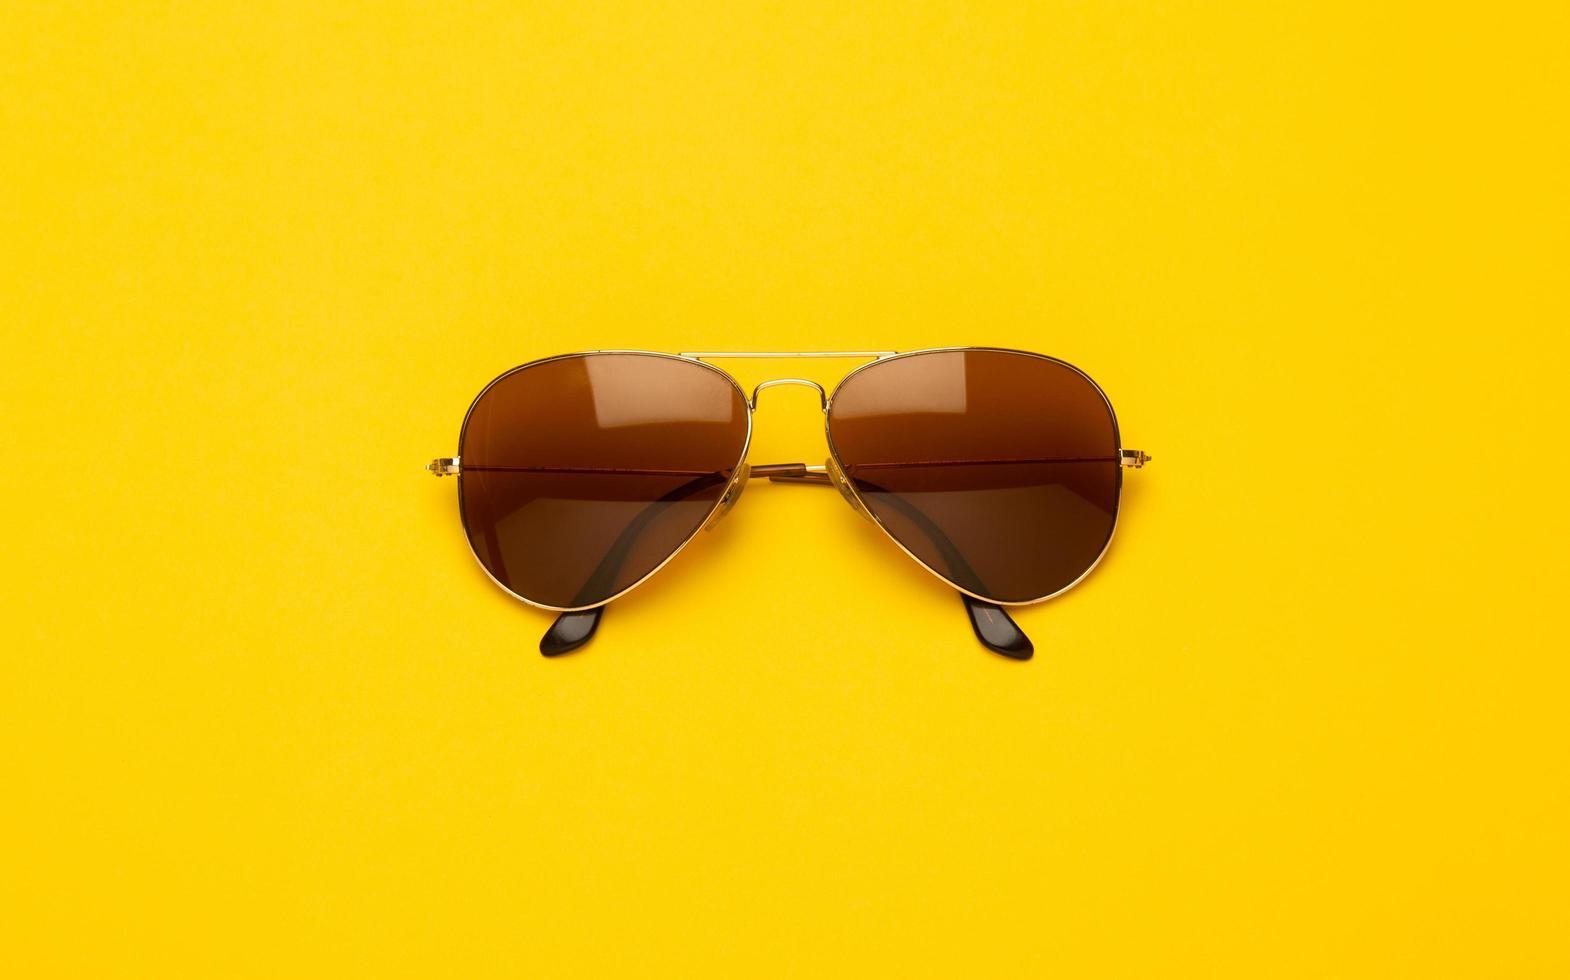 bruine zonnebril op gele achtergrond foto